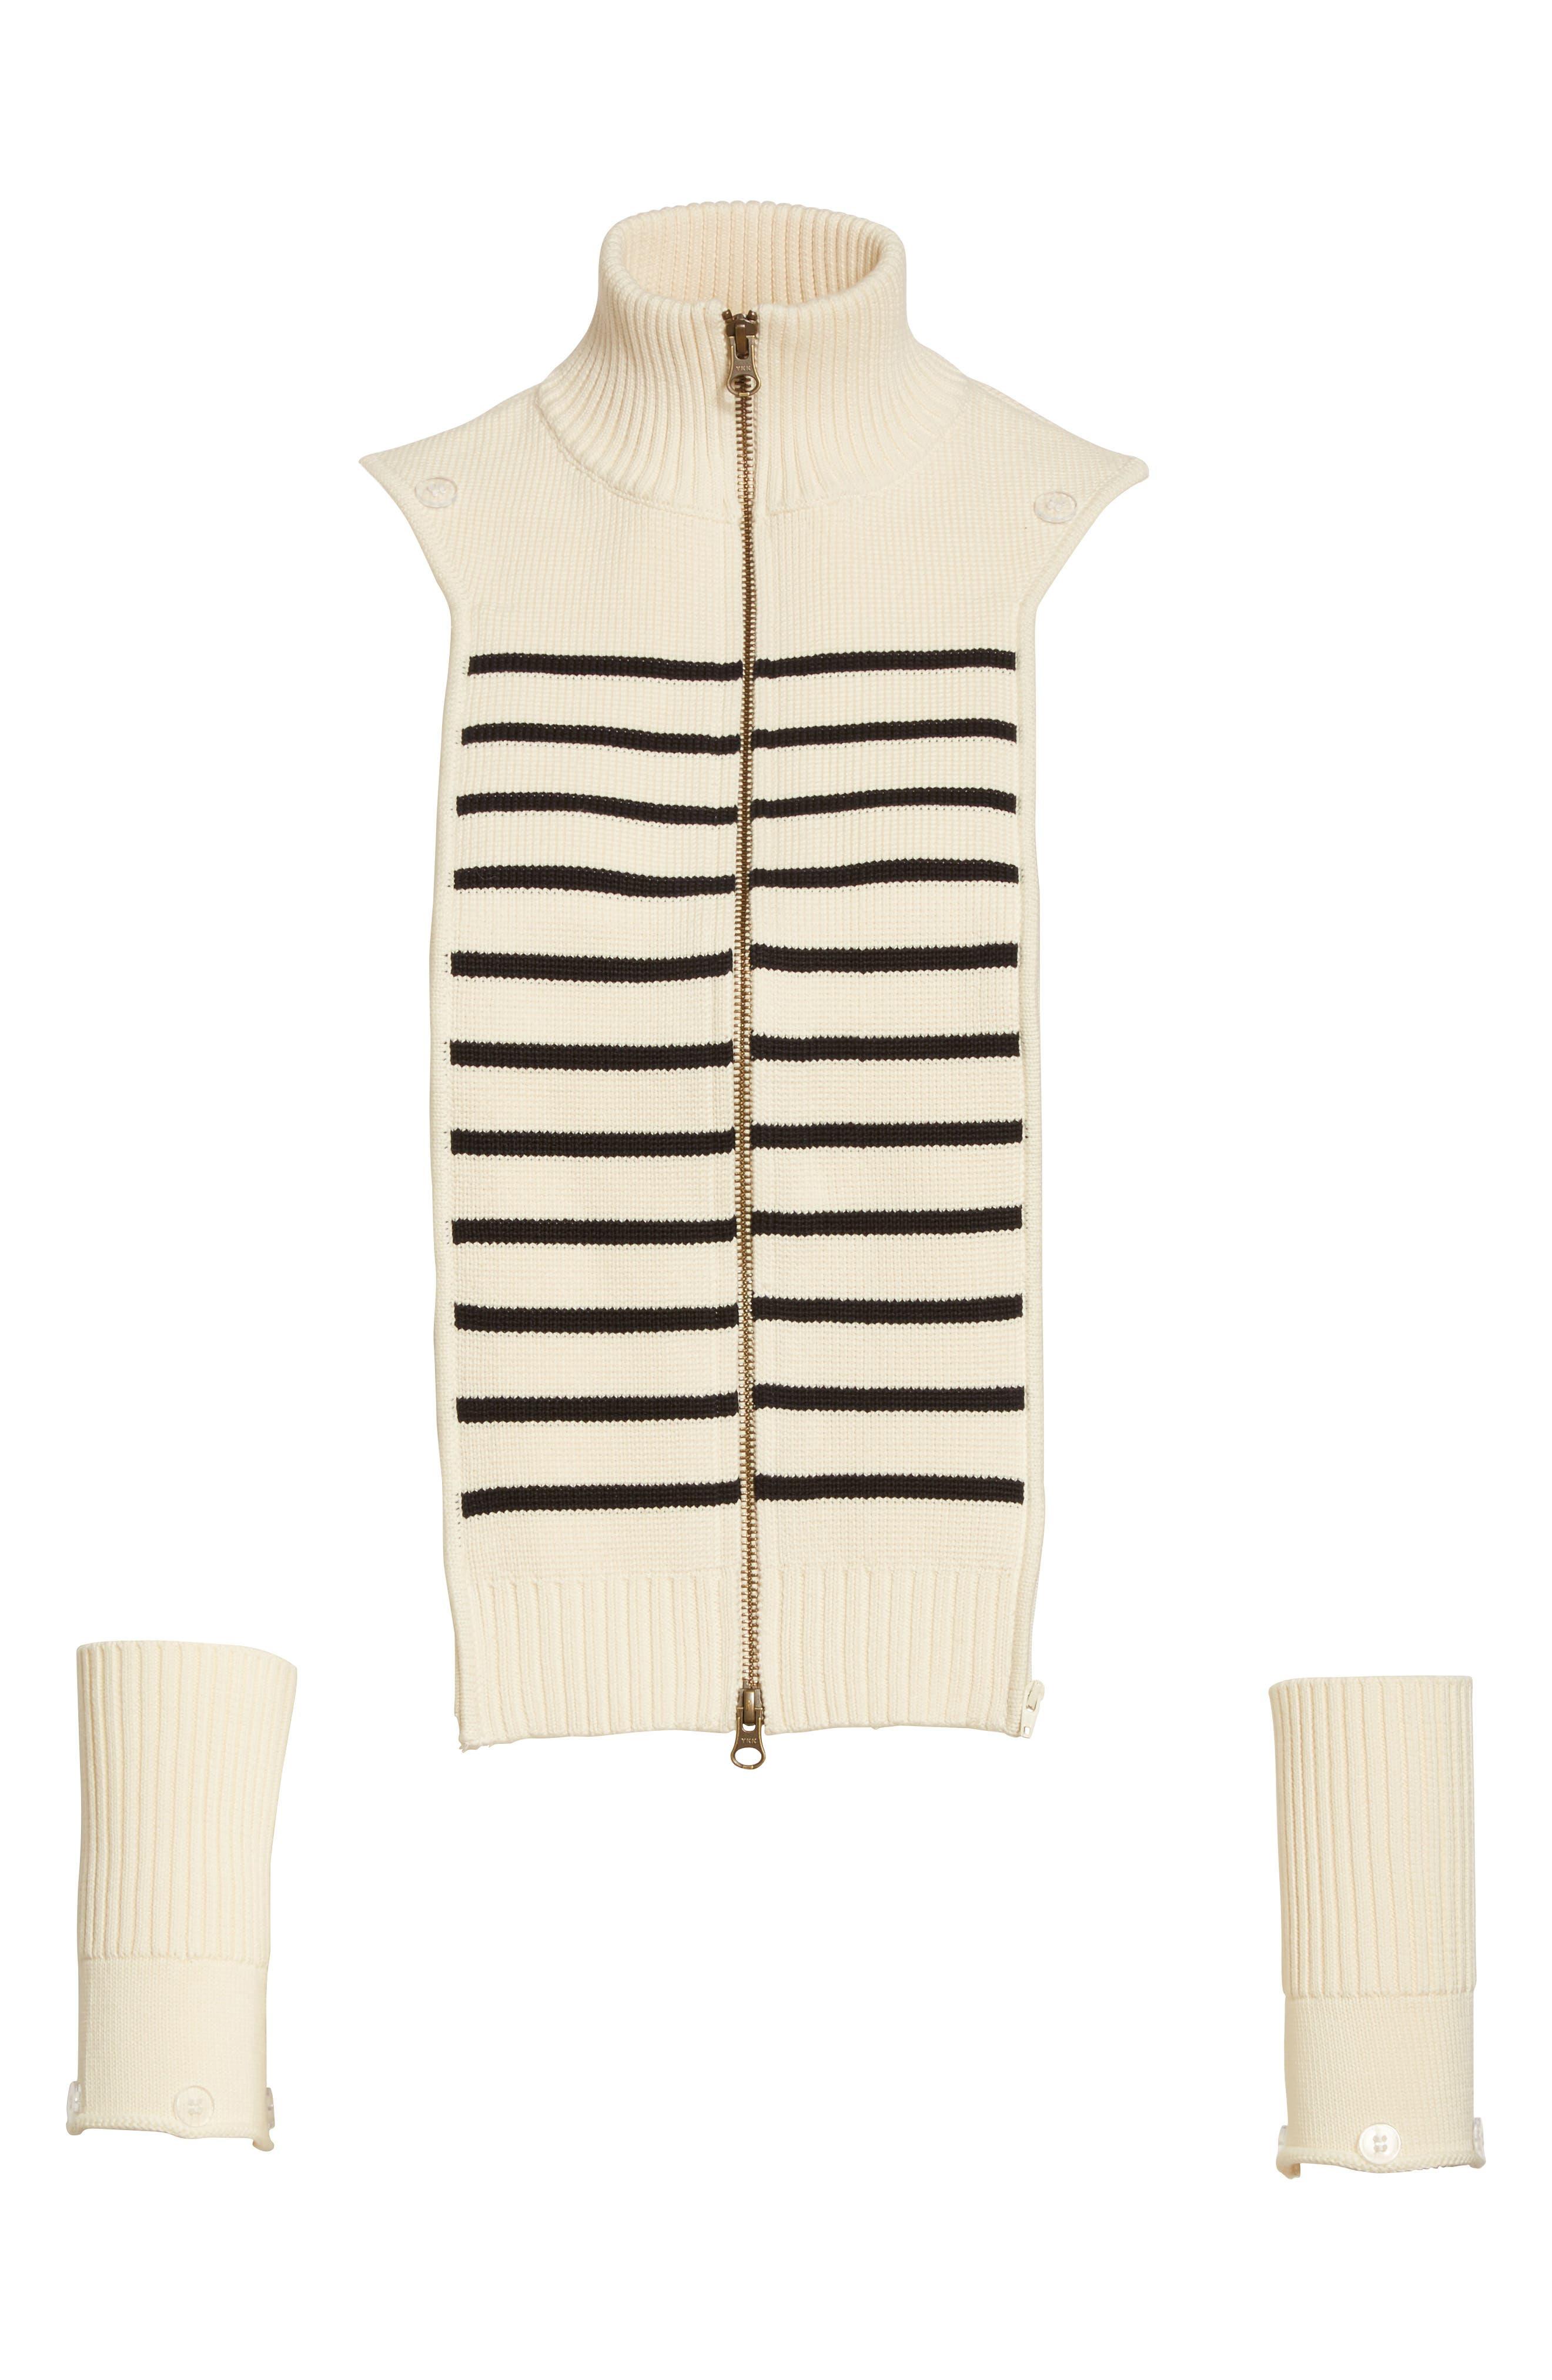 Alternate Image 1 Selected - Veronica Beard Mariner Stripe Dickey & Cuffs